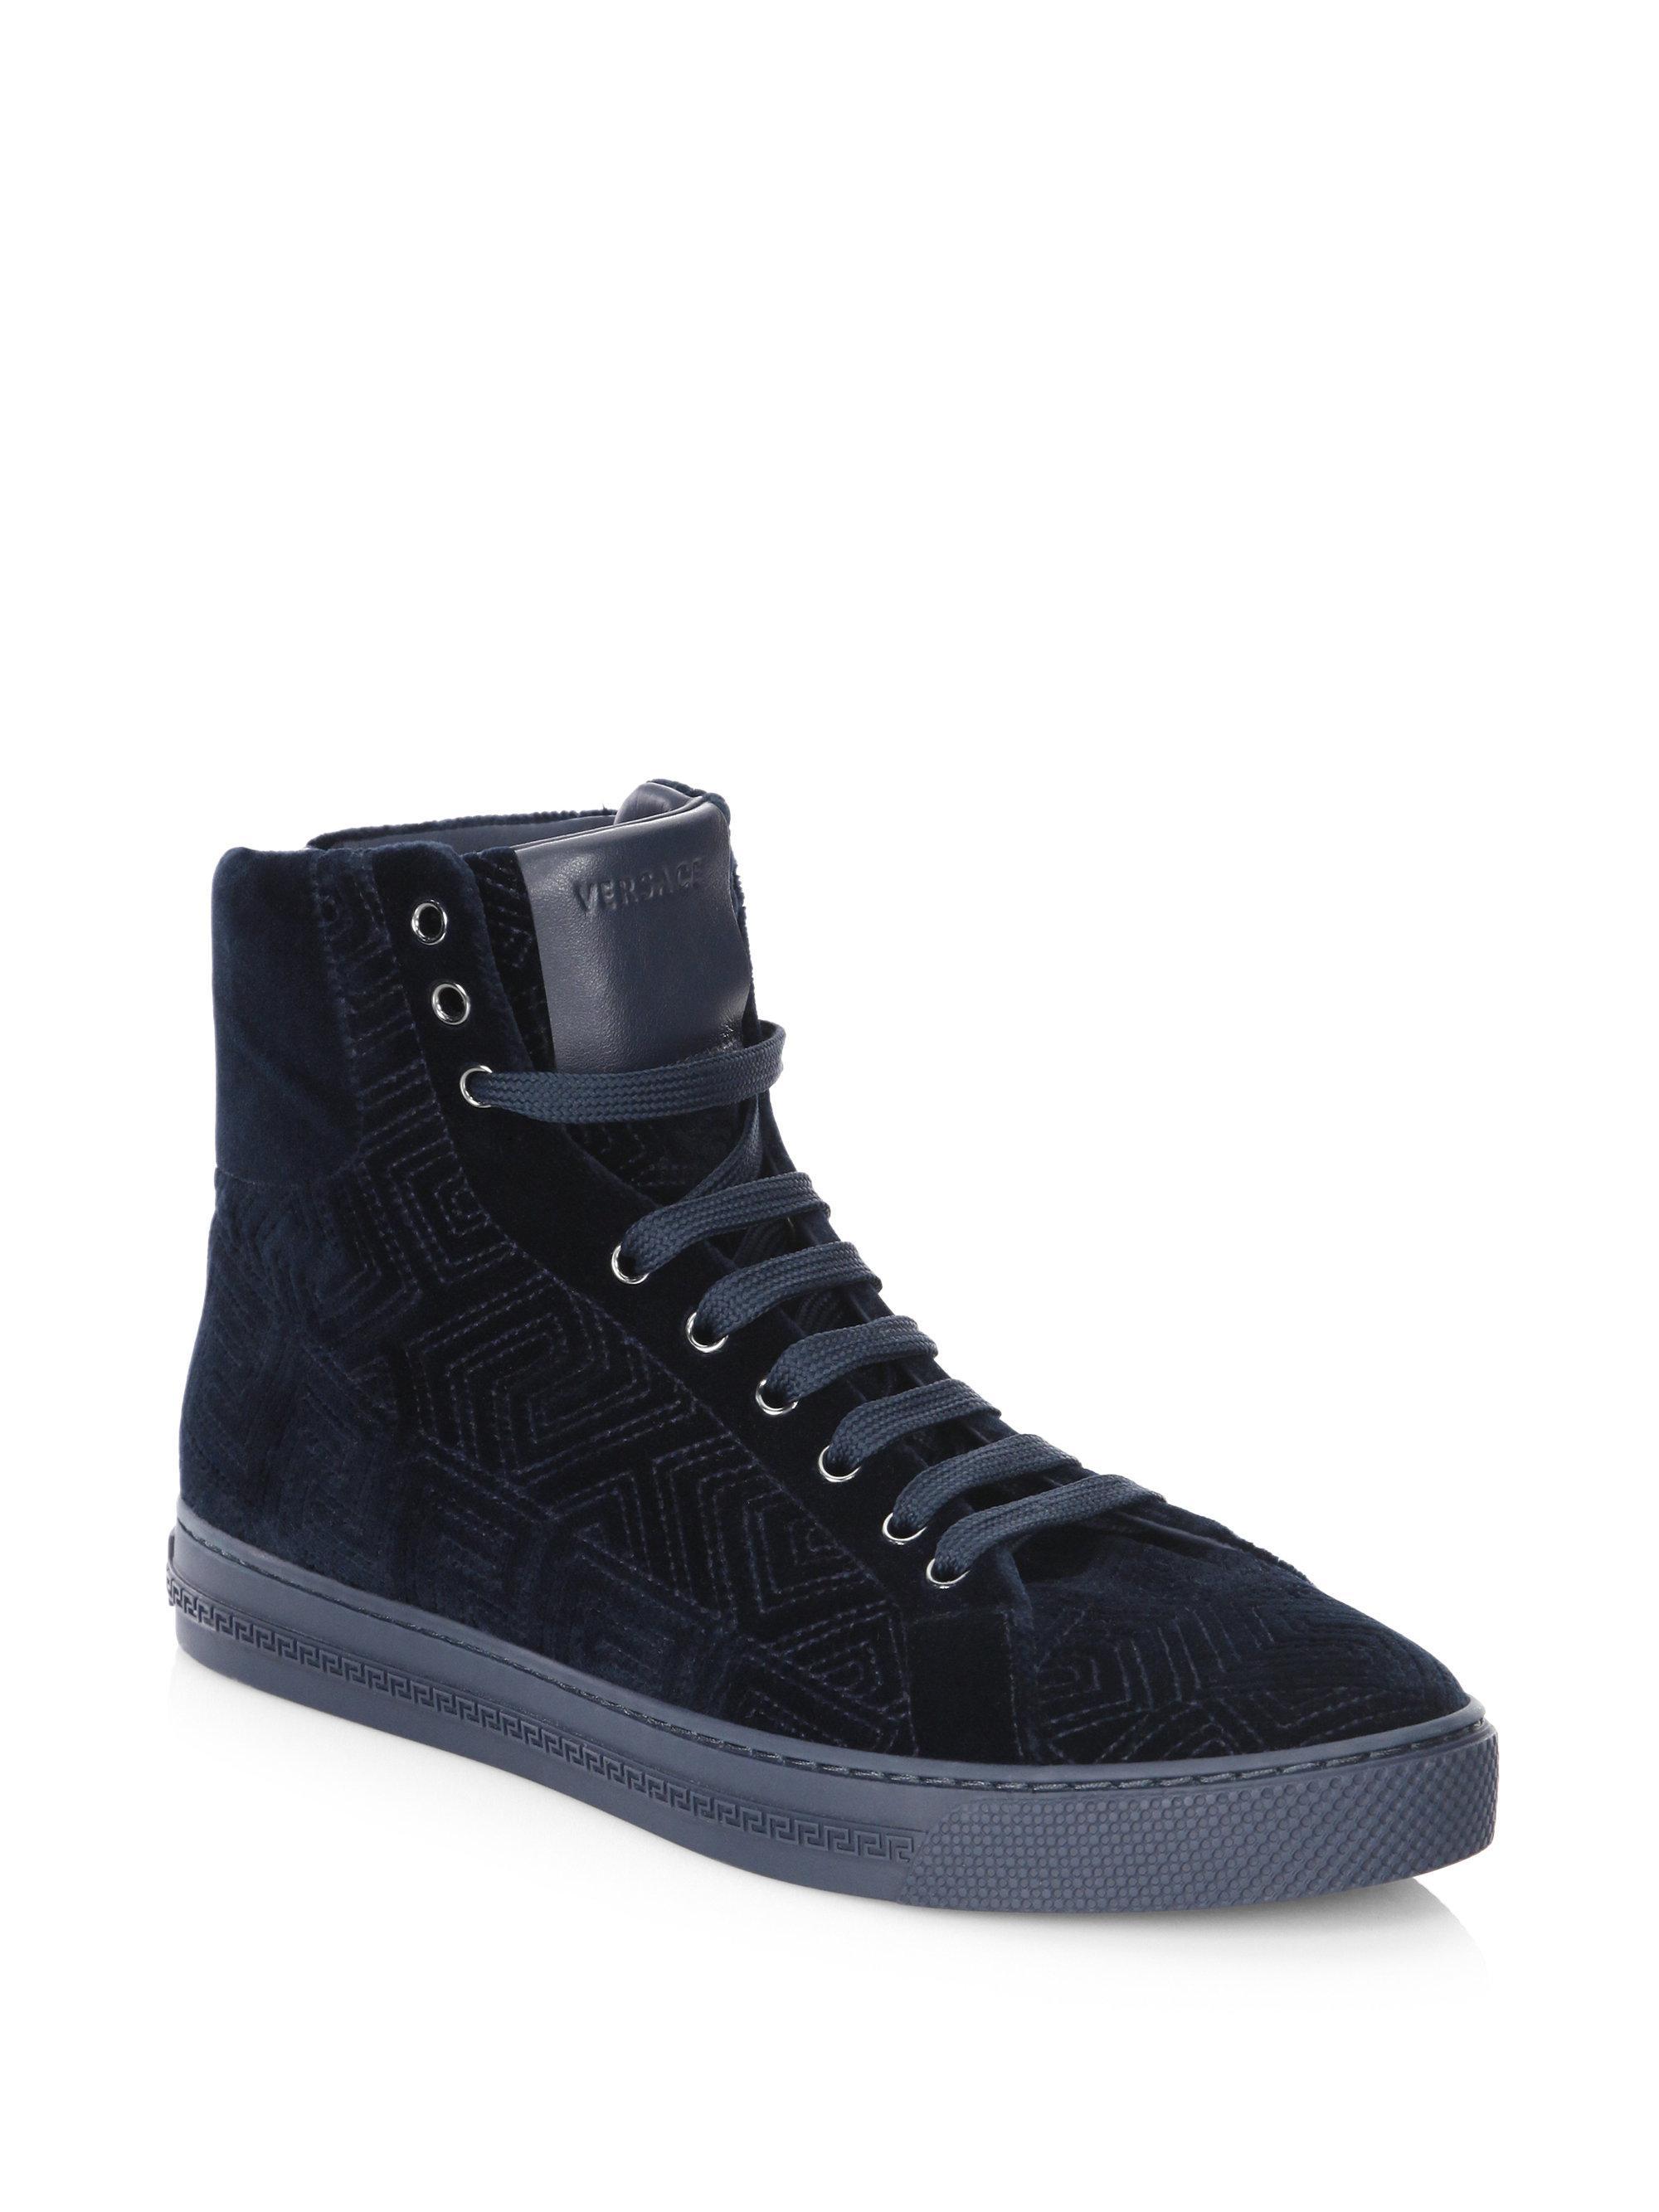 VERSACE Topstitched Velvet Hi-Top Sneakers oWZsUTwli